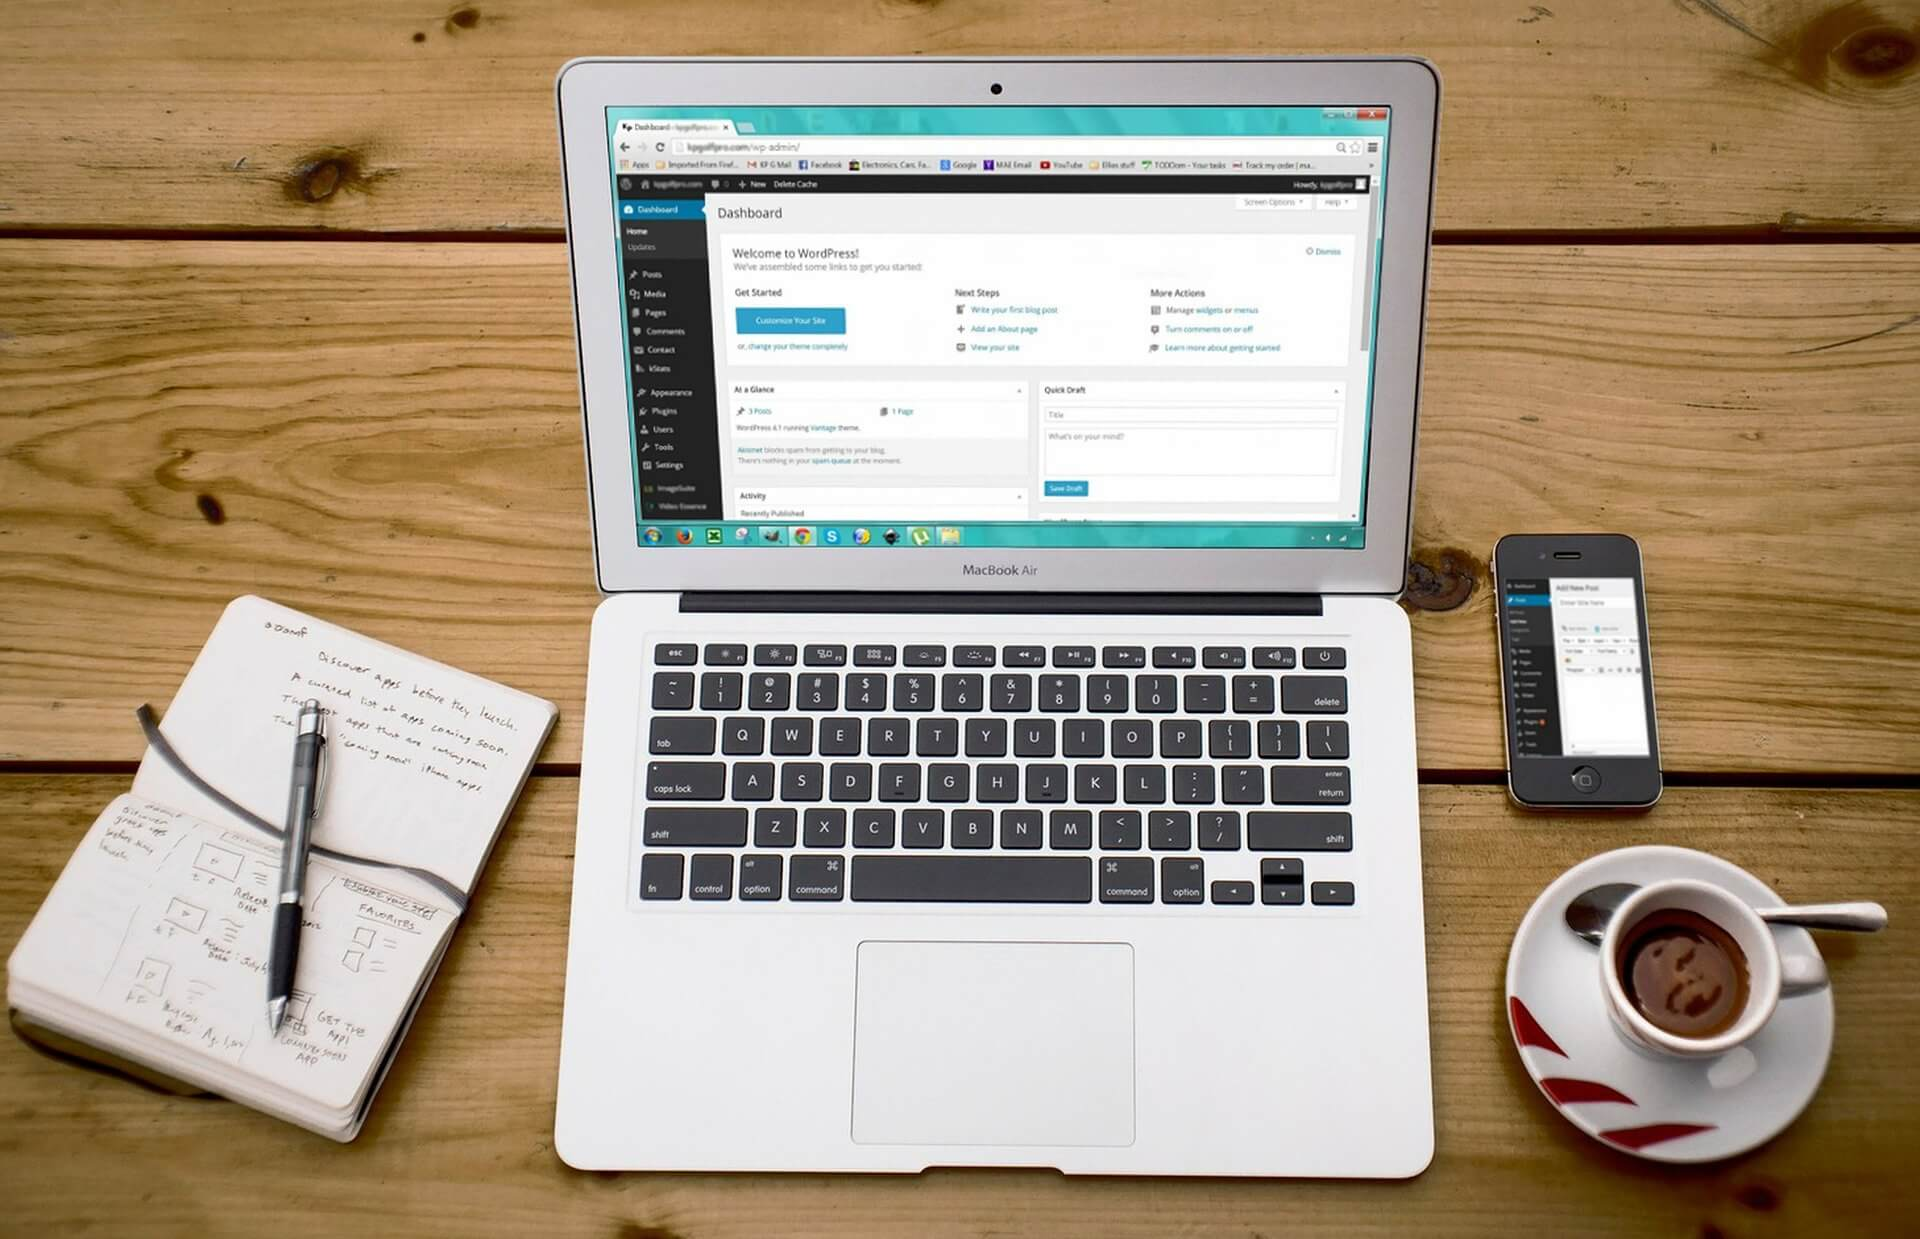 Praca na Wordpress